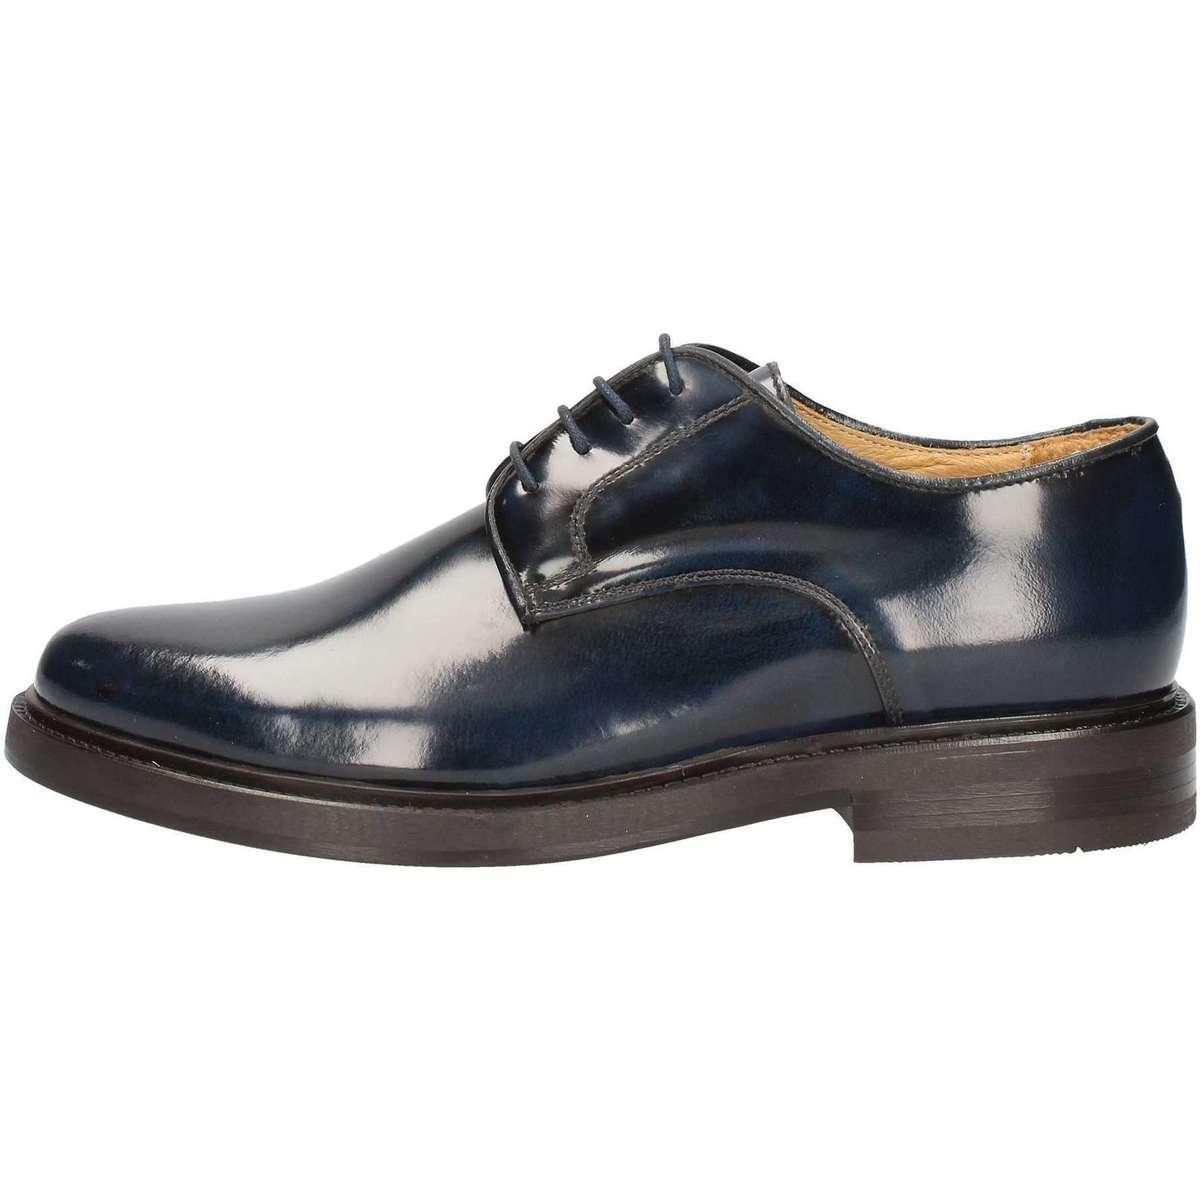 Hudson 901 Lace up shoes Mann Blau Blau - Schuhe Sneaker High Herren 92,20 €